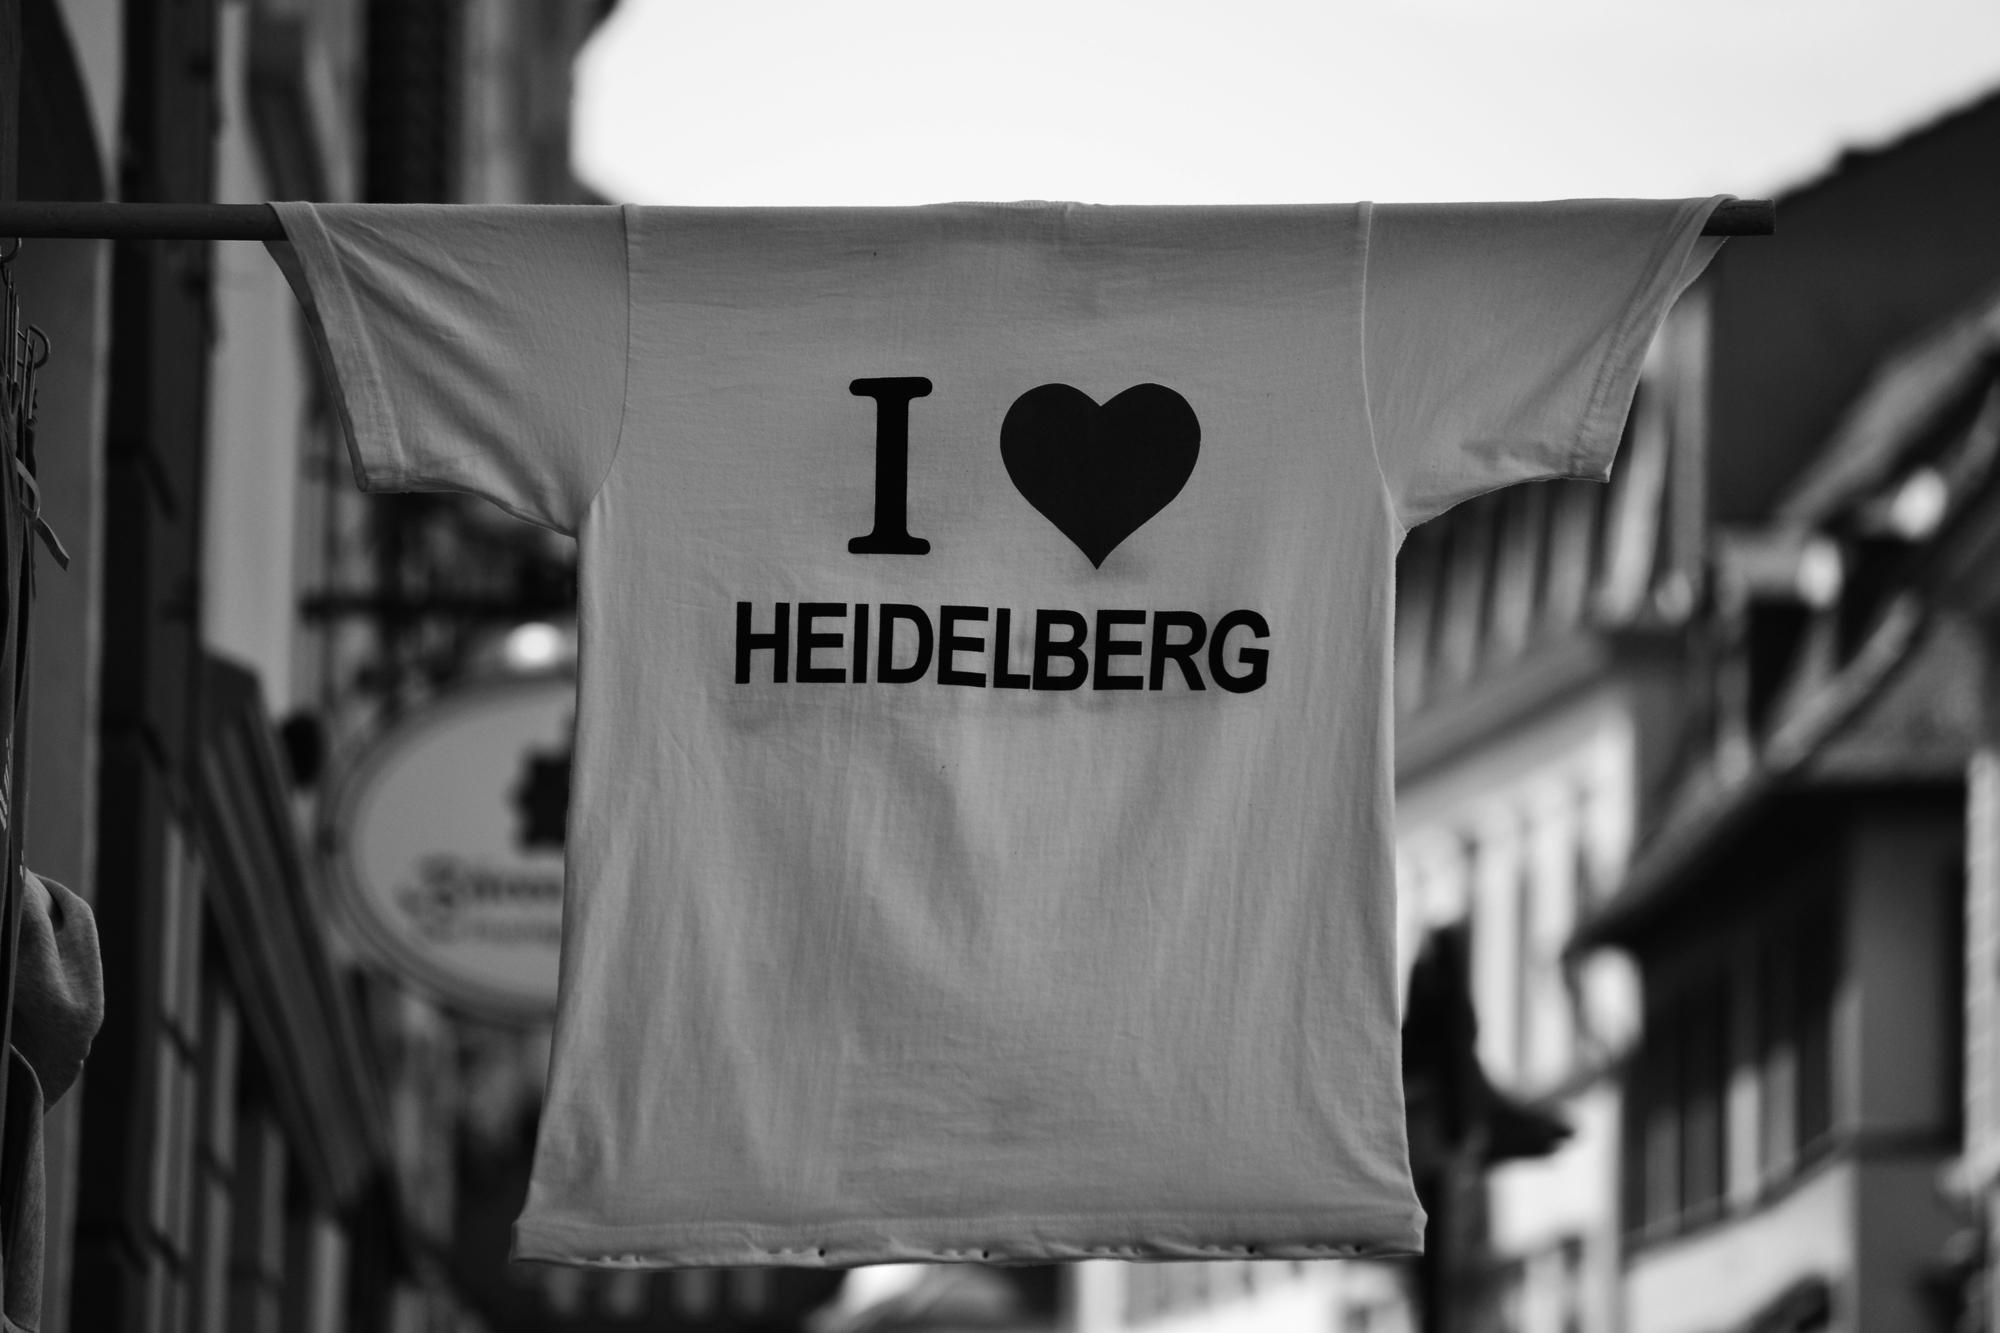 ass lover sexkontakte heidelberg